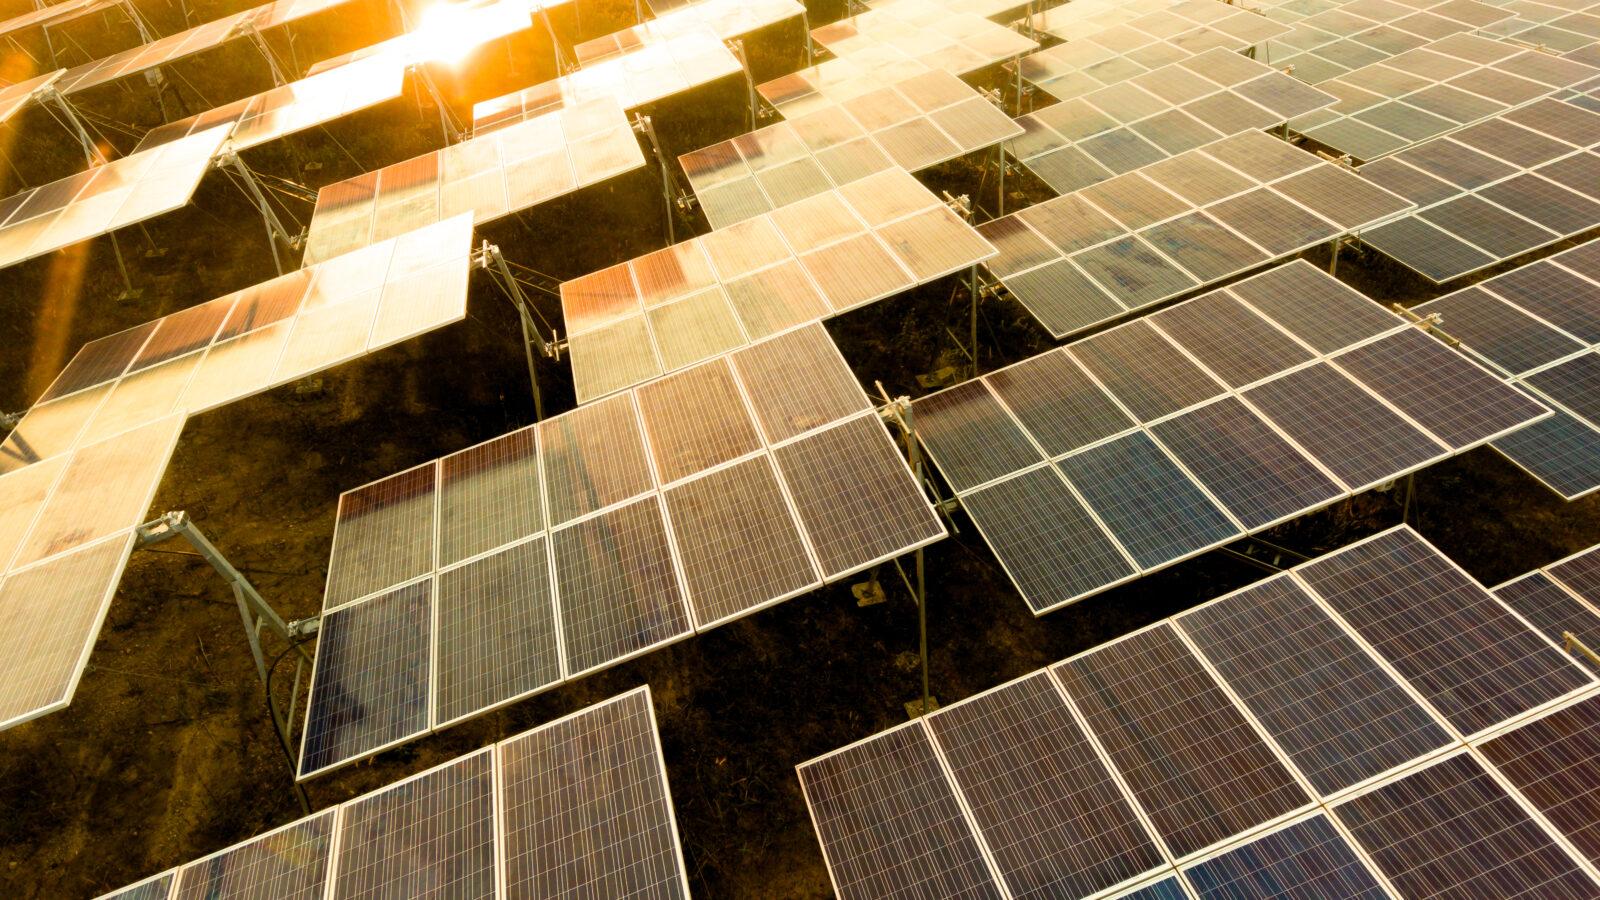 Image shows solar panels